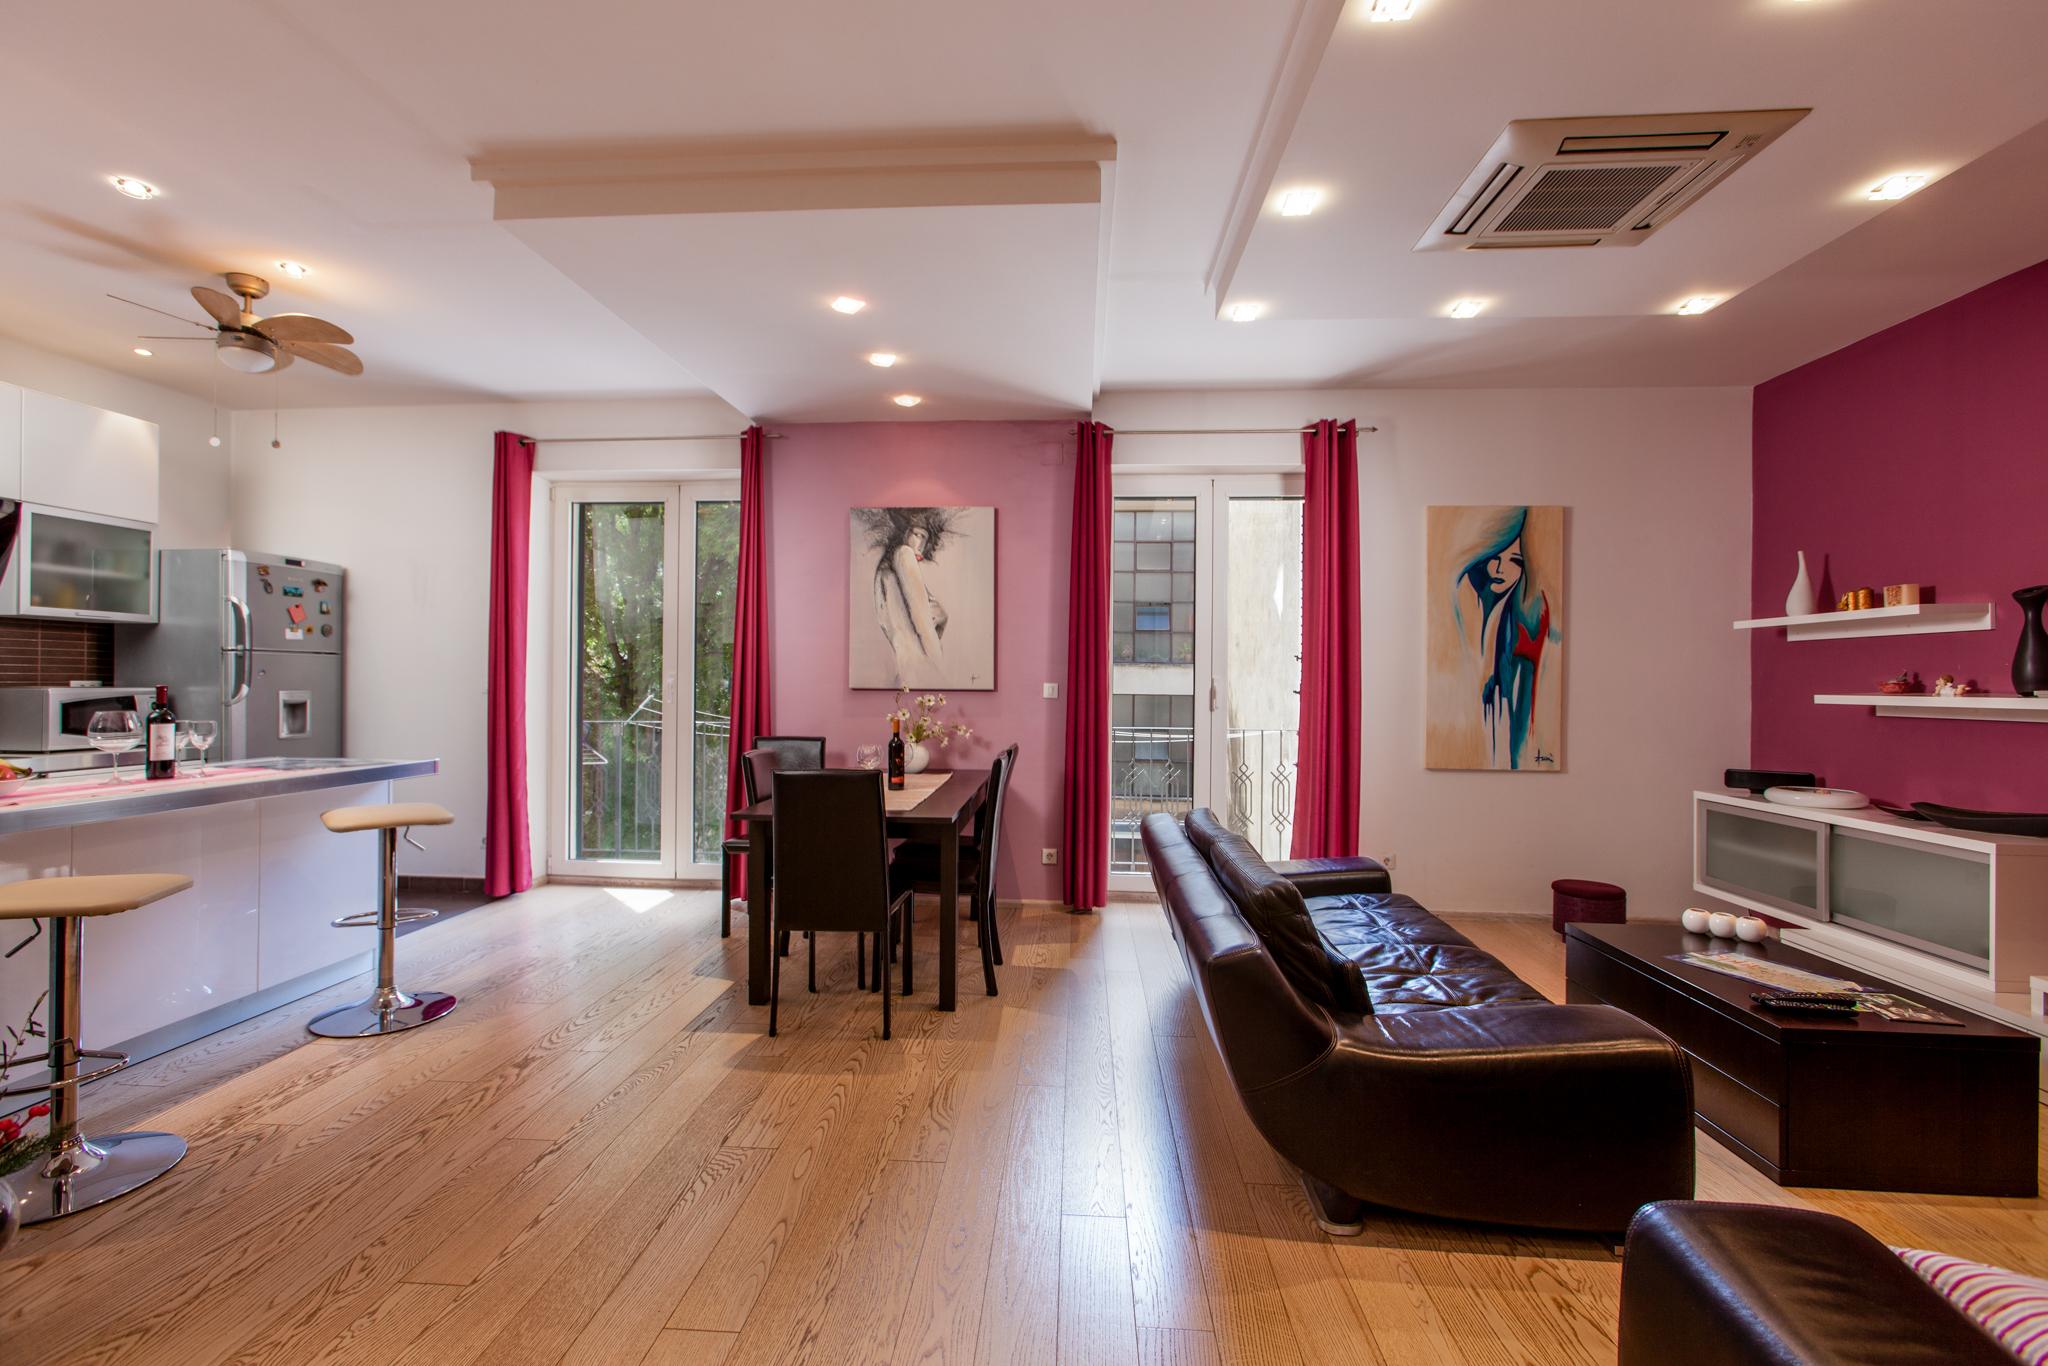 Apartment Split - Aspalathos (14)